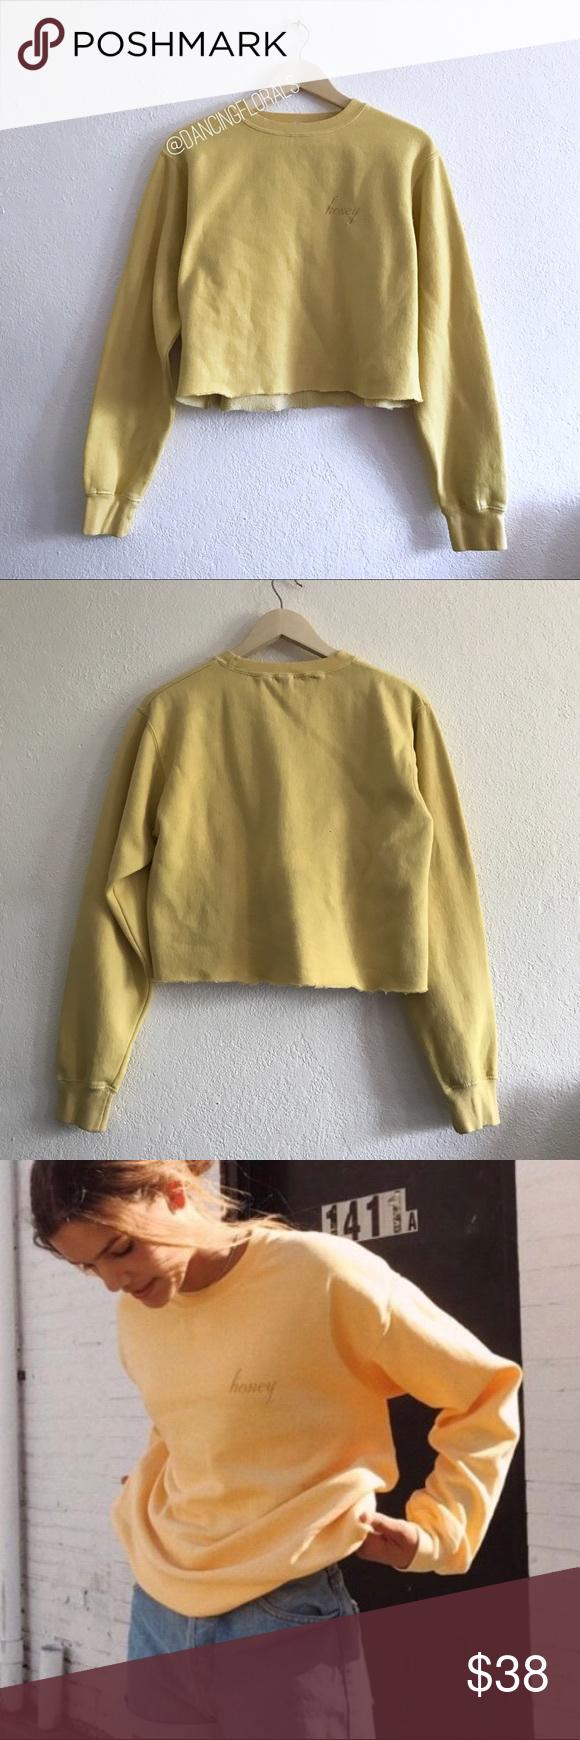 Brandy Melville Honey Yellow Crop Sweater Brandy Melville Honey